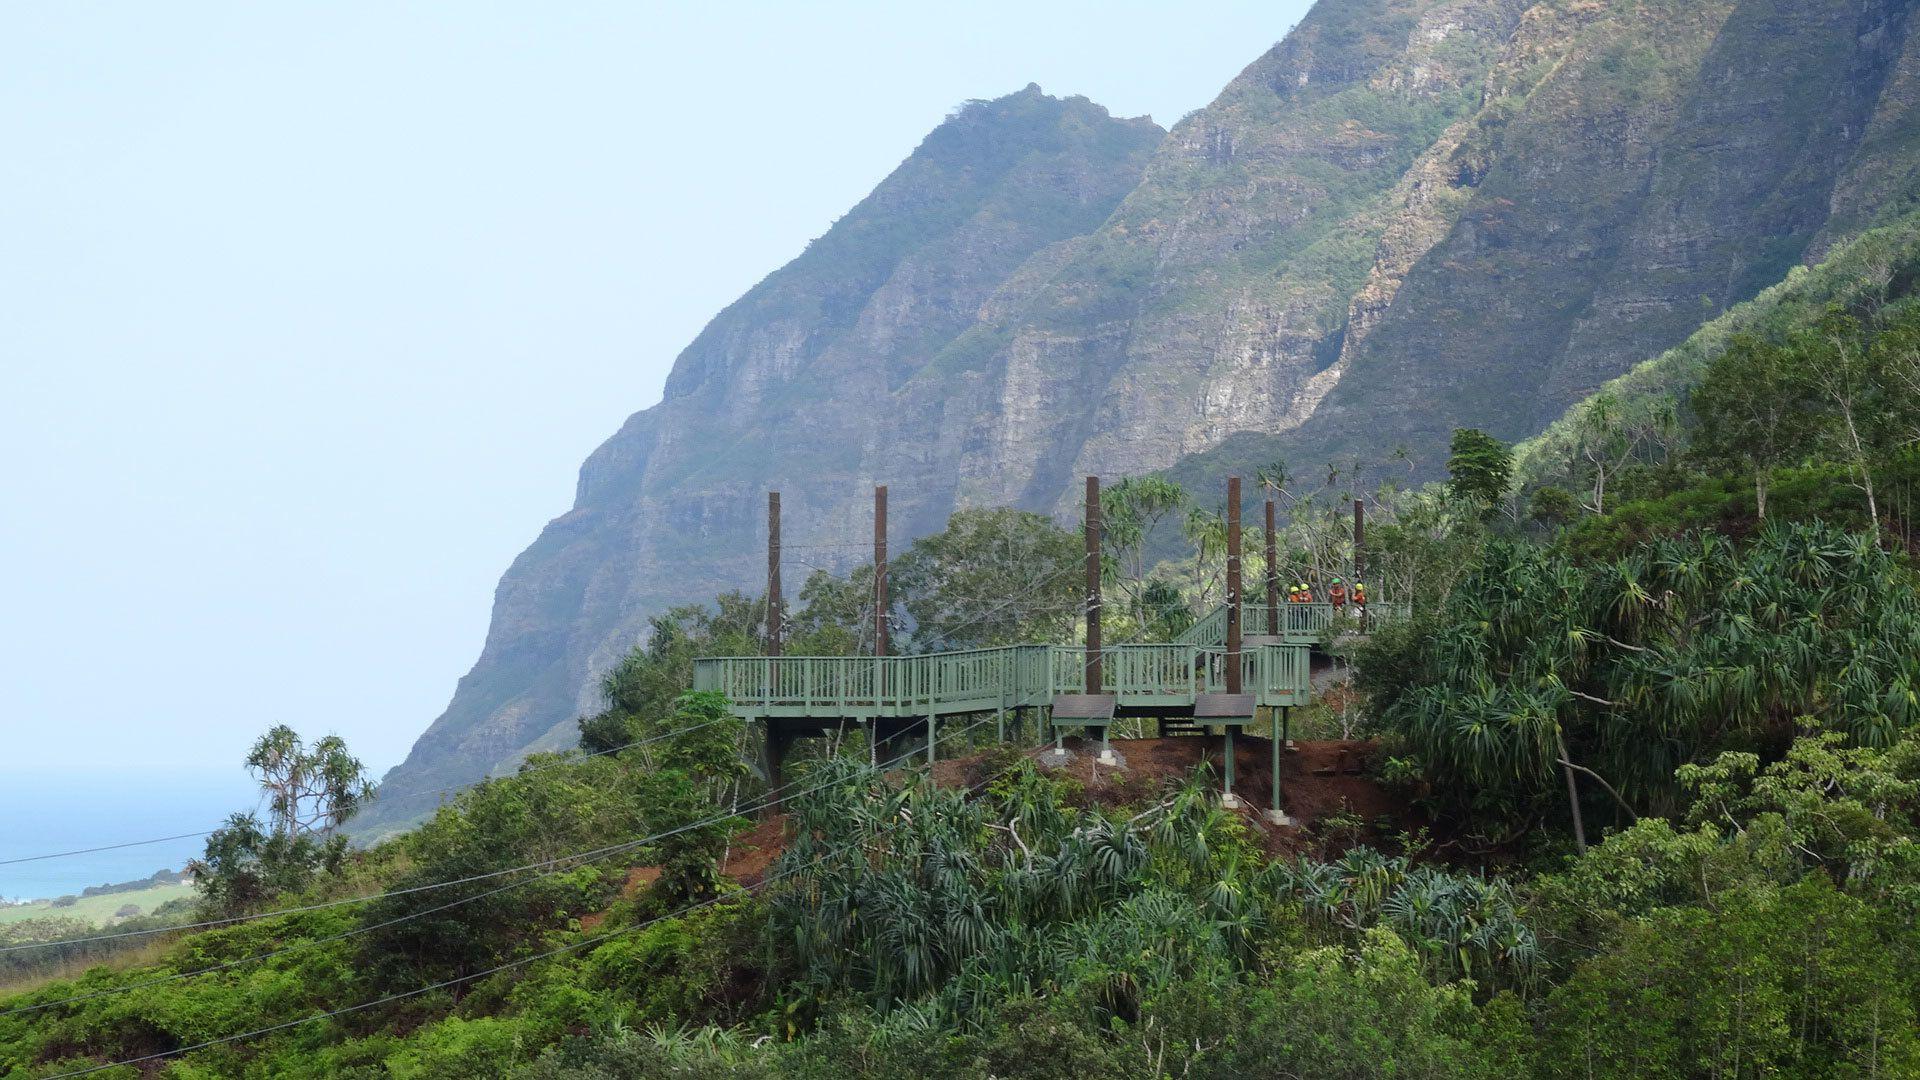 Zipline launch platform and mountains on Oahu